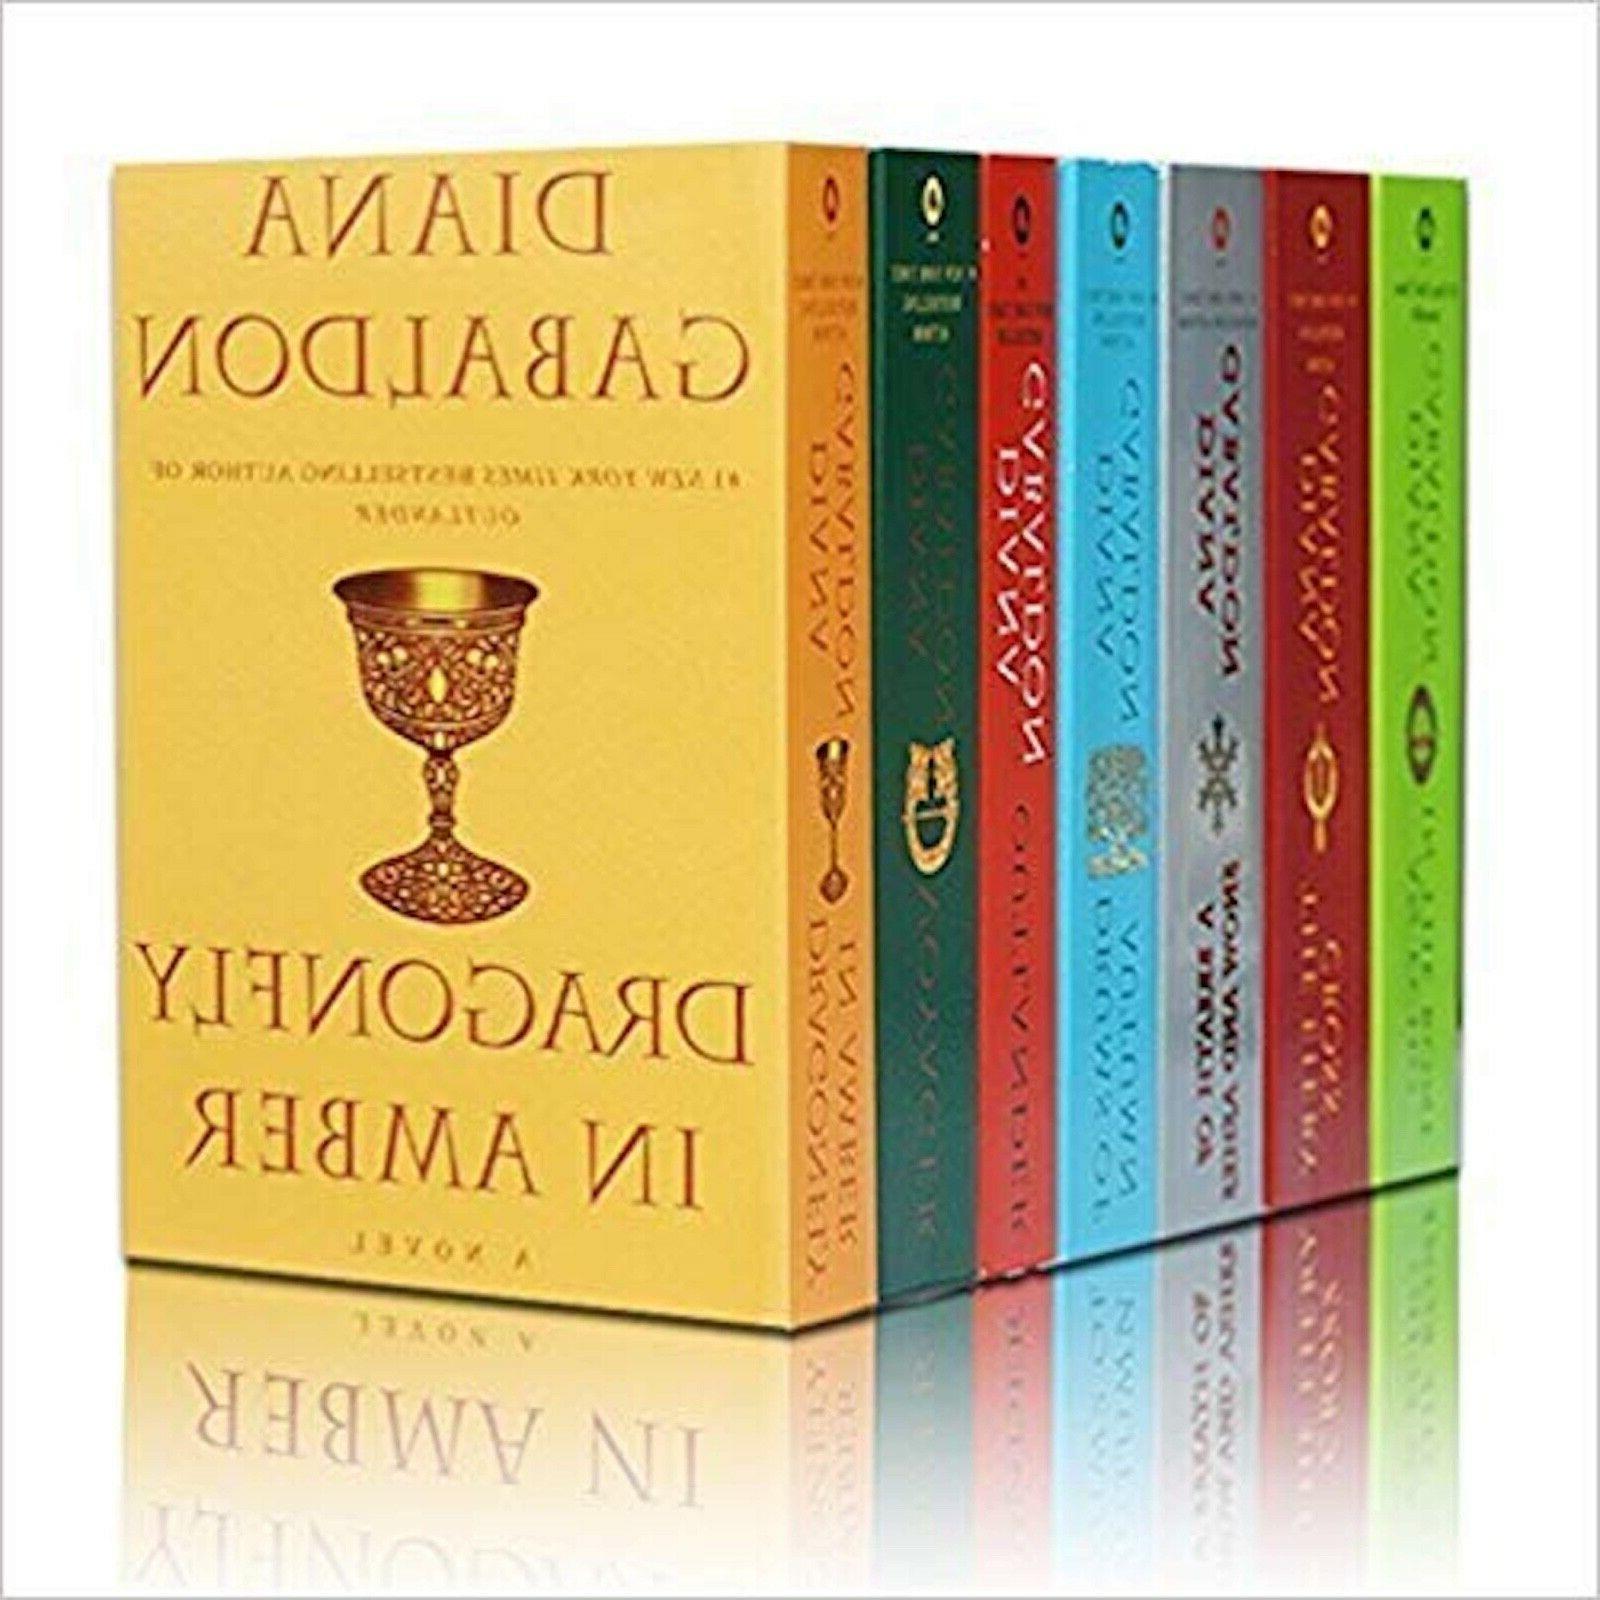 outlander series collection large trade paperback set